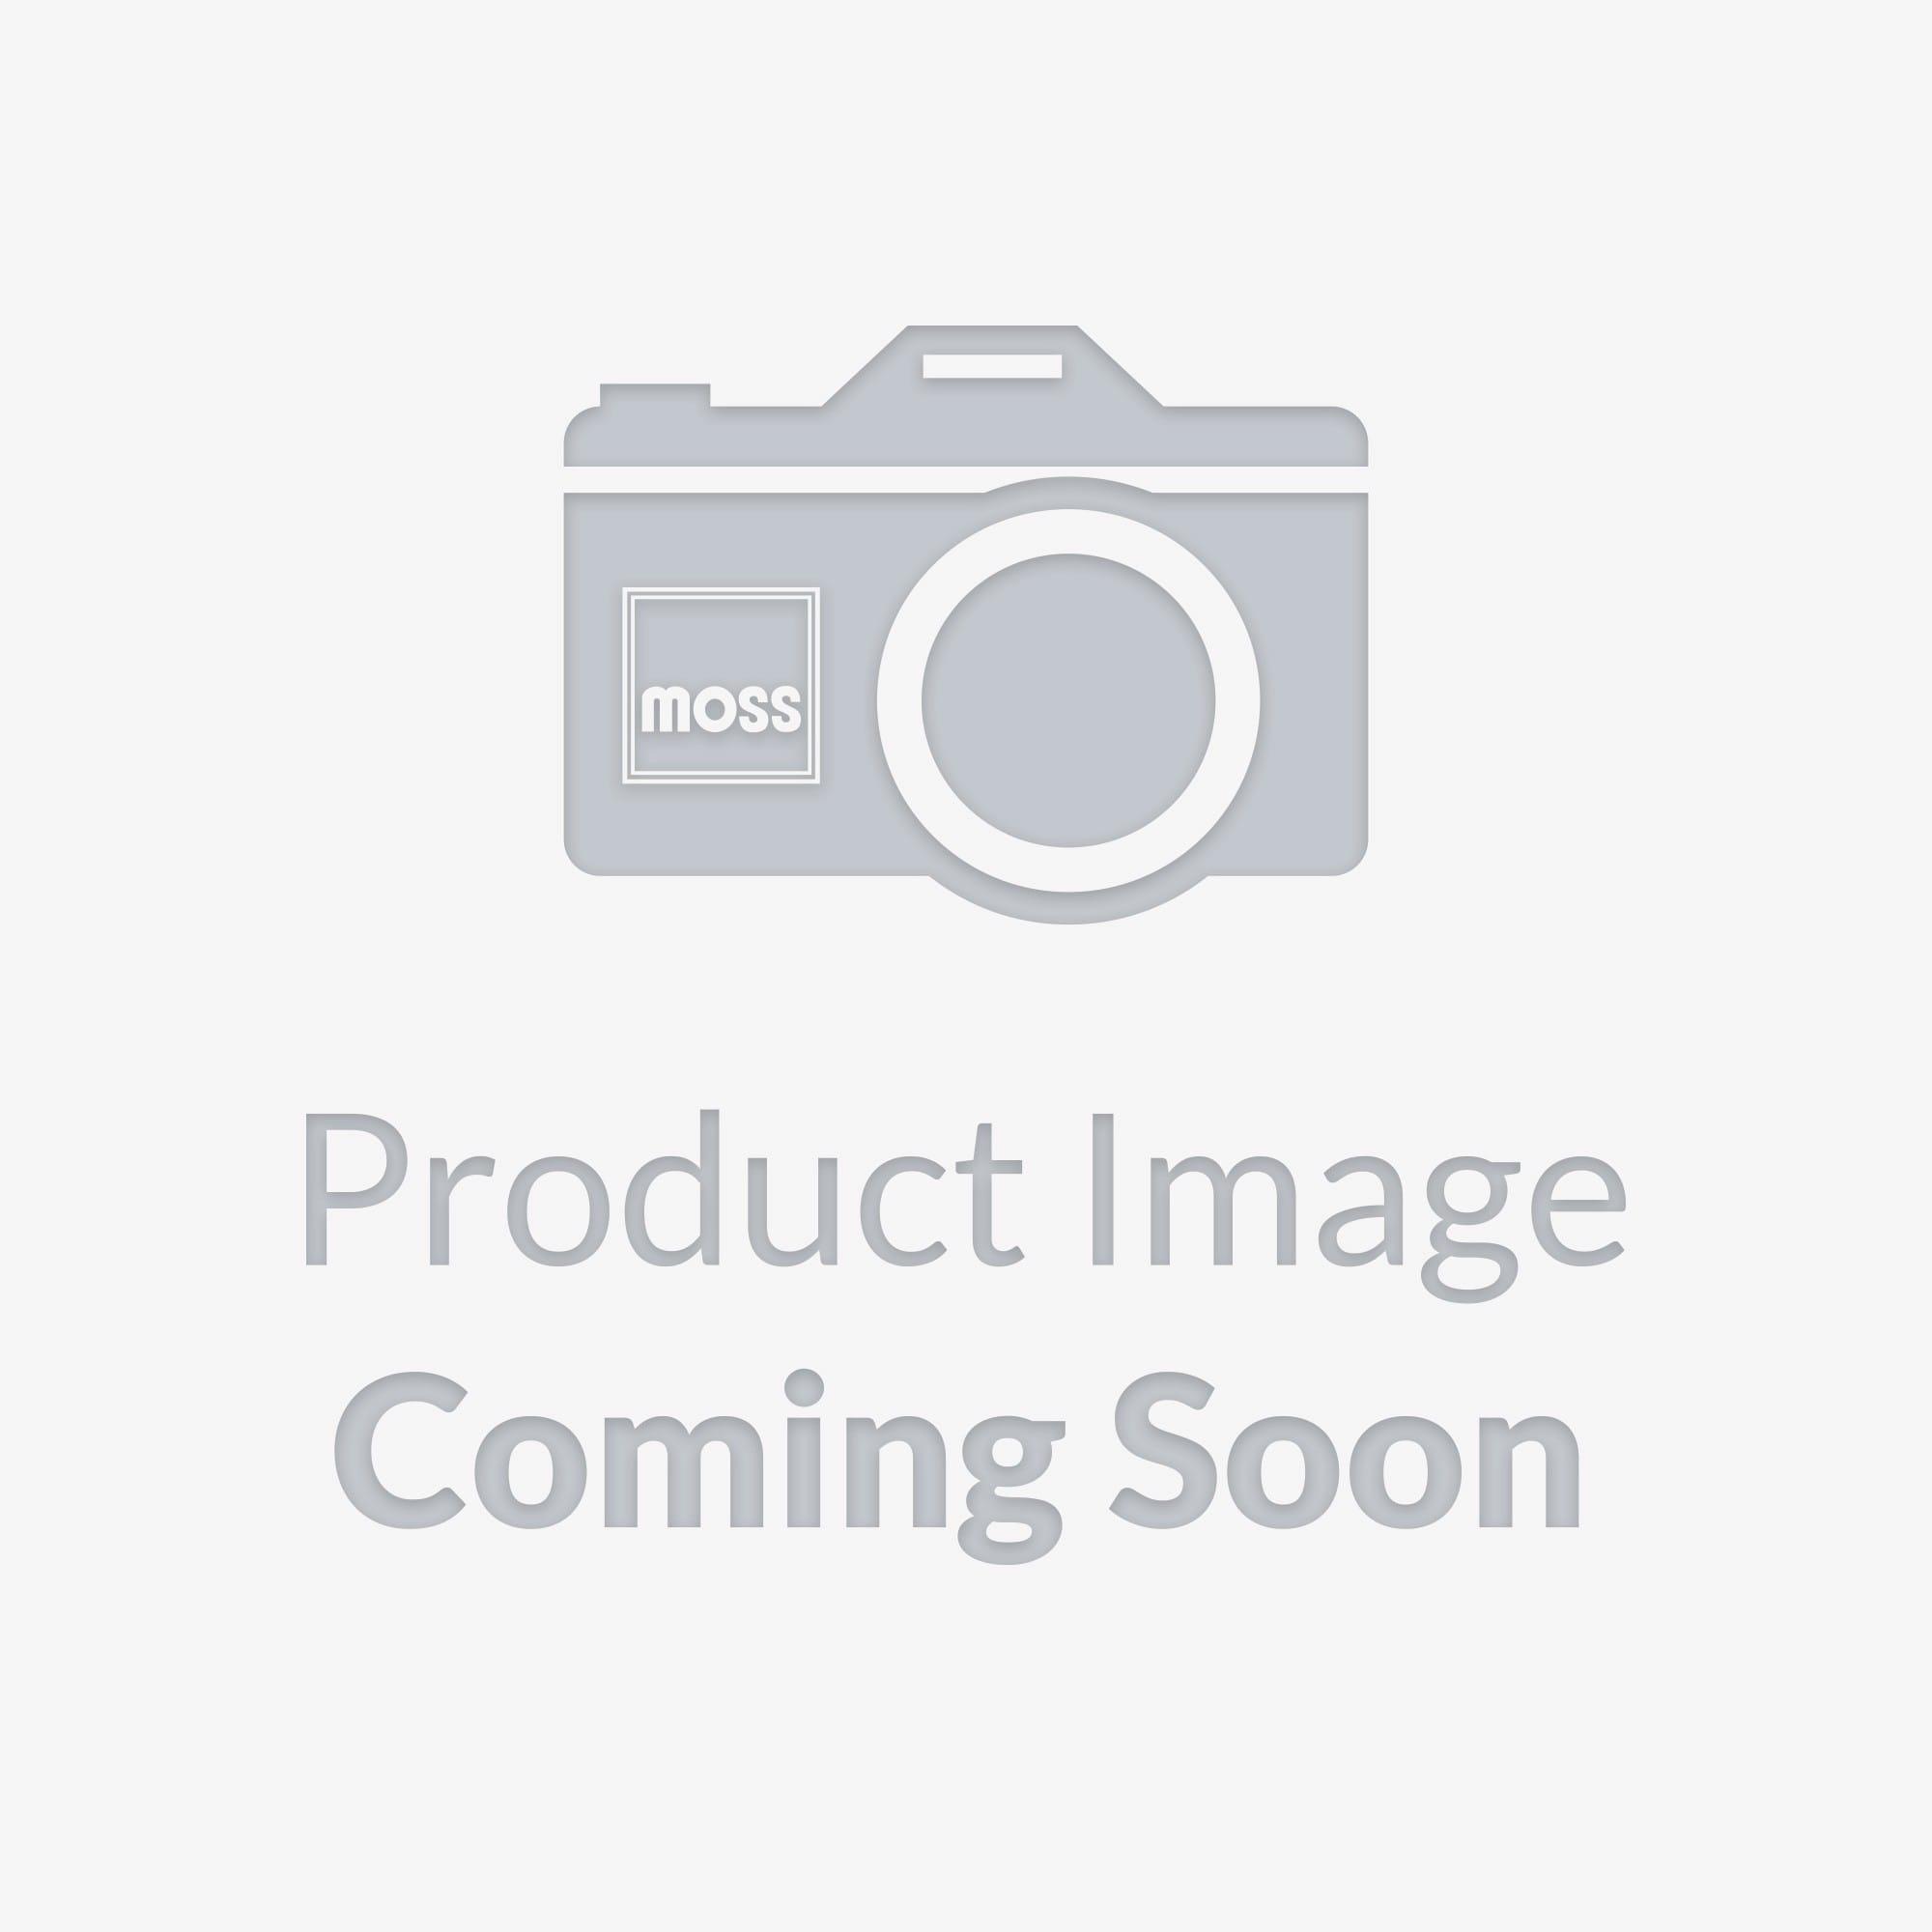 Classic Mini Restoration Parts And Accessories Moss Motors